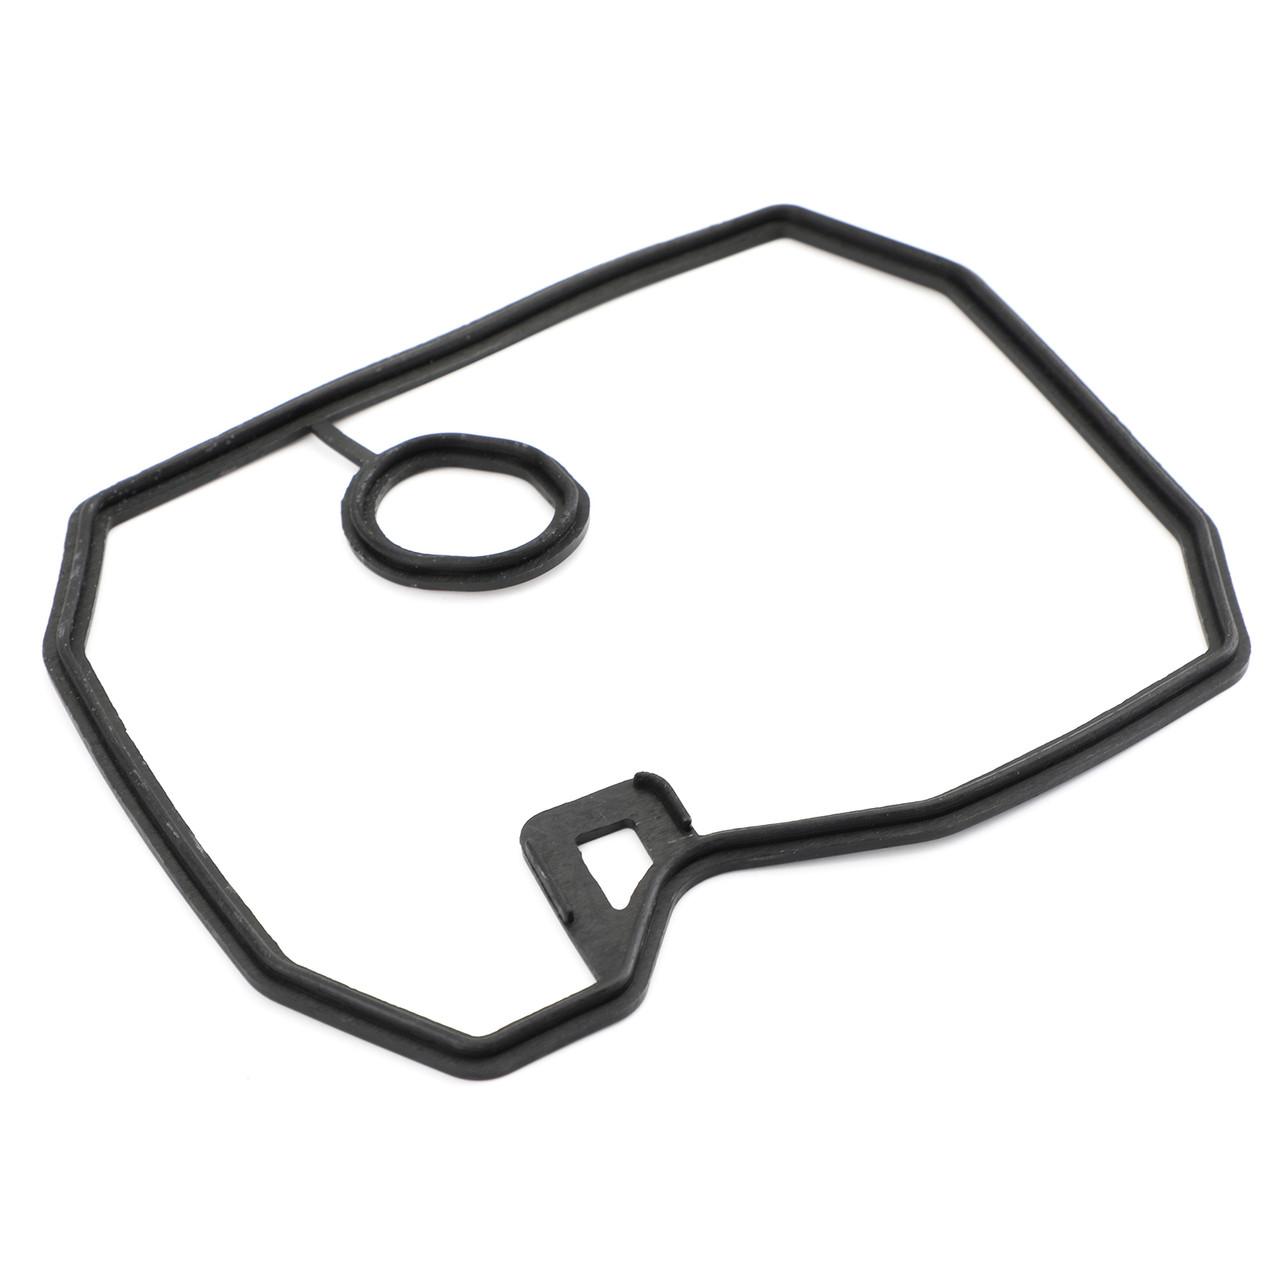 Vehicle Parts & Accessories Gaskets & Seals Honda XRV 750